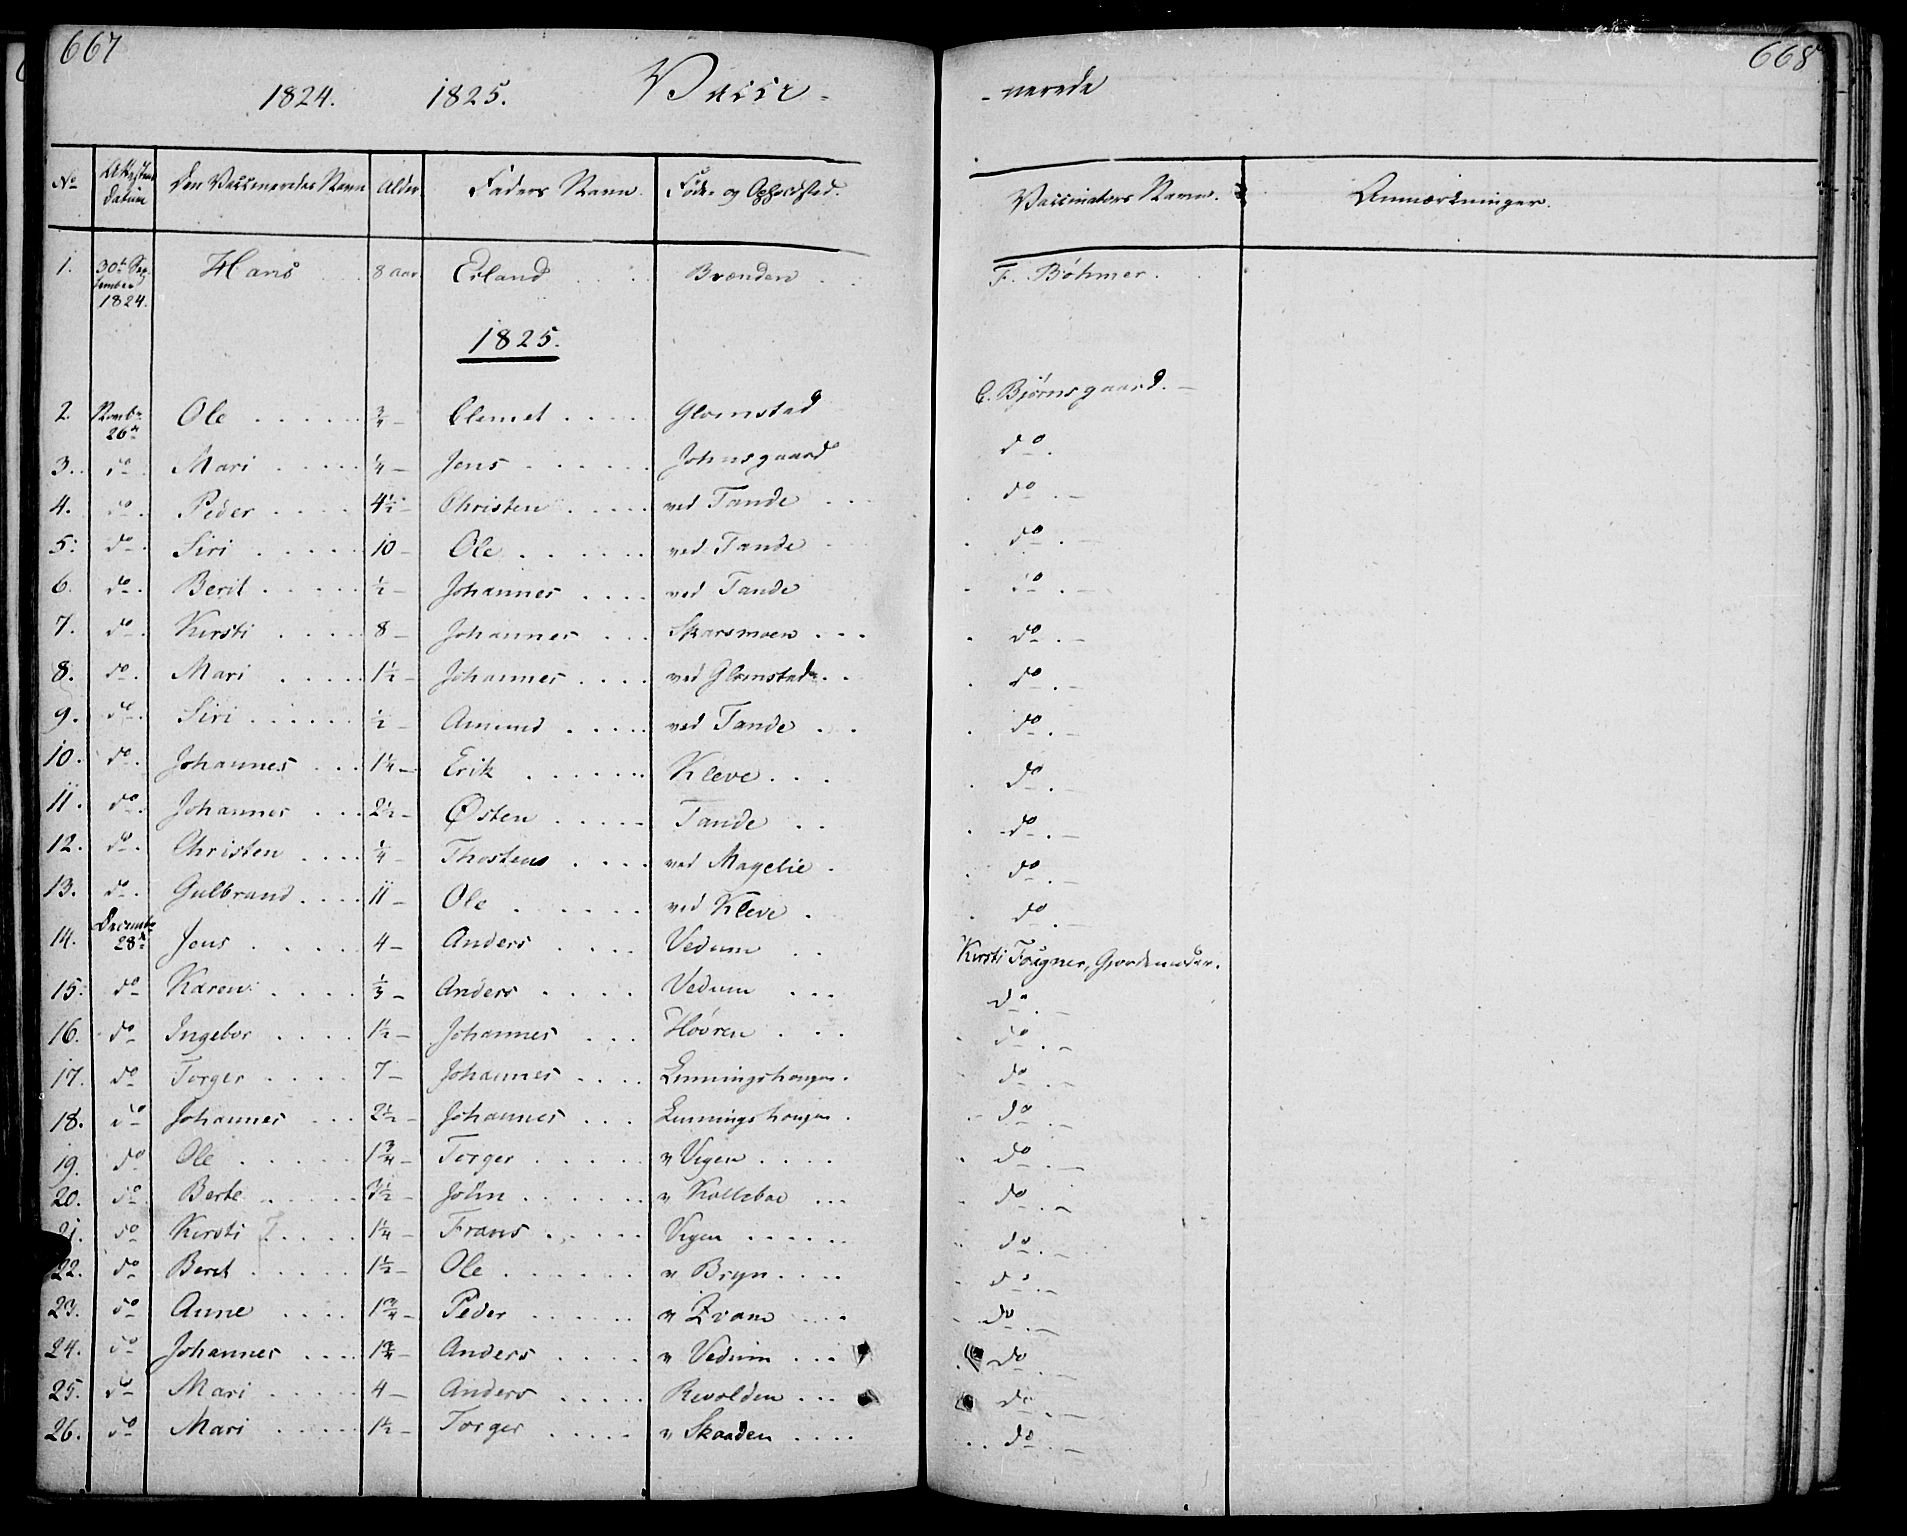 SAH, Øyer prestekontor, Ministerialbok nr. 4, 1824-1841, s. 667-668